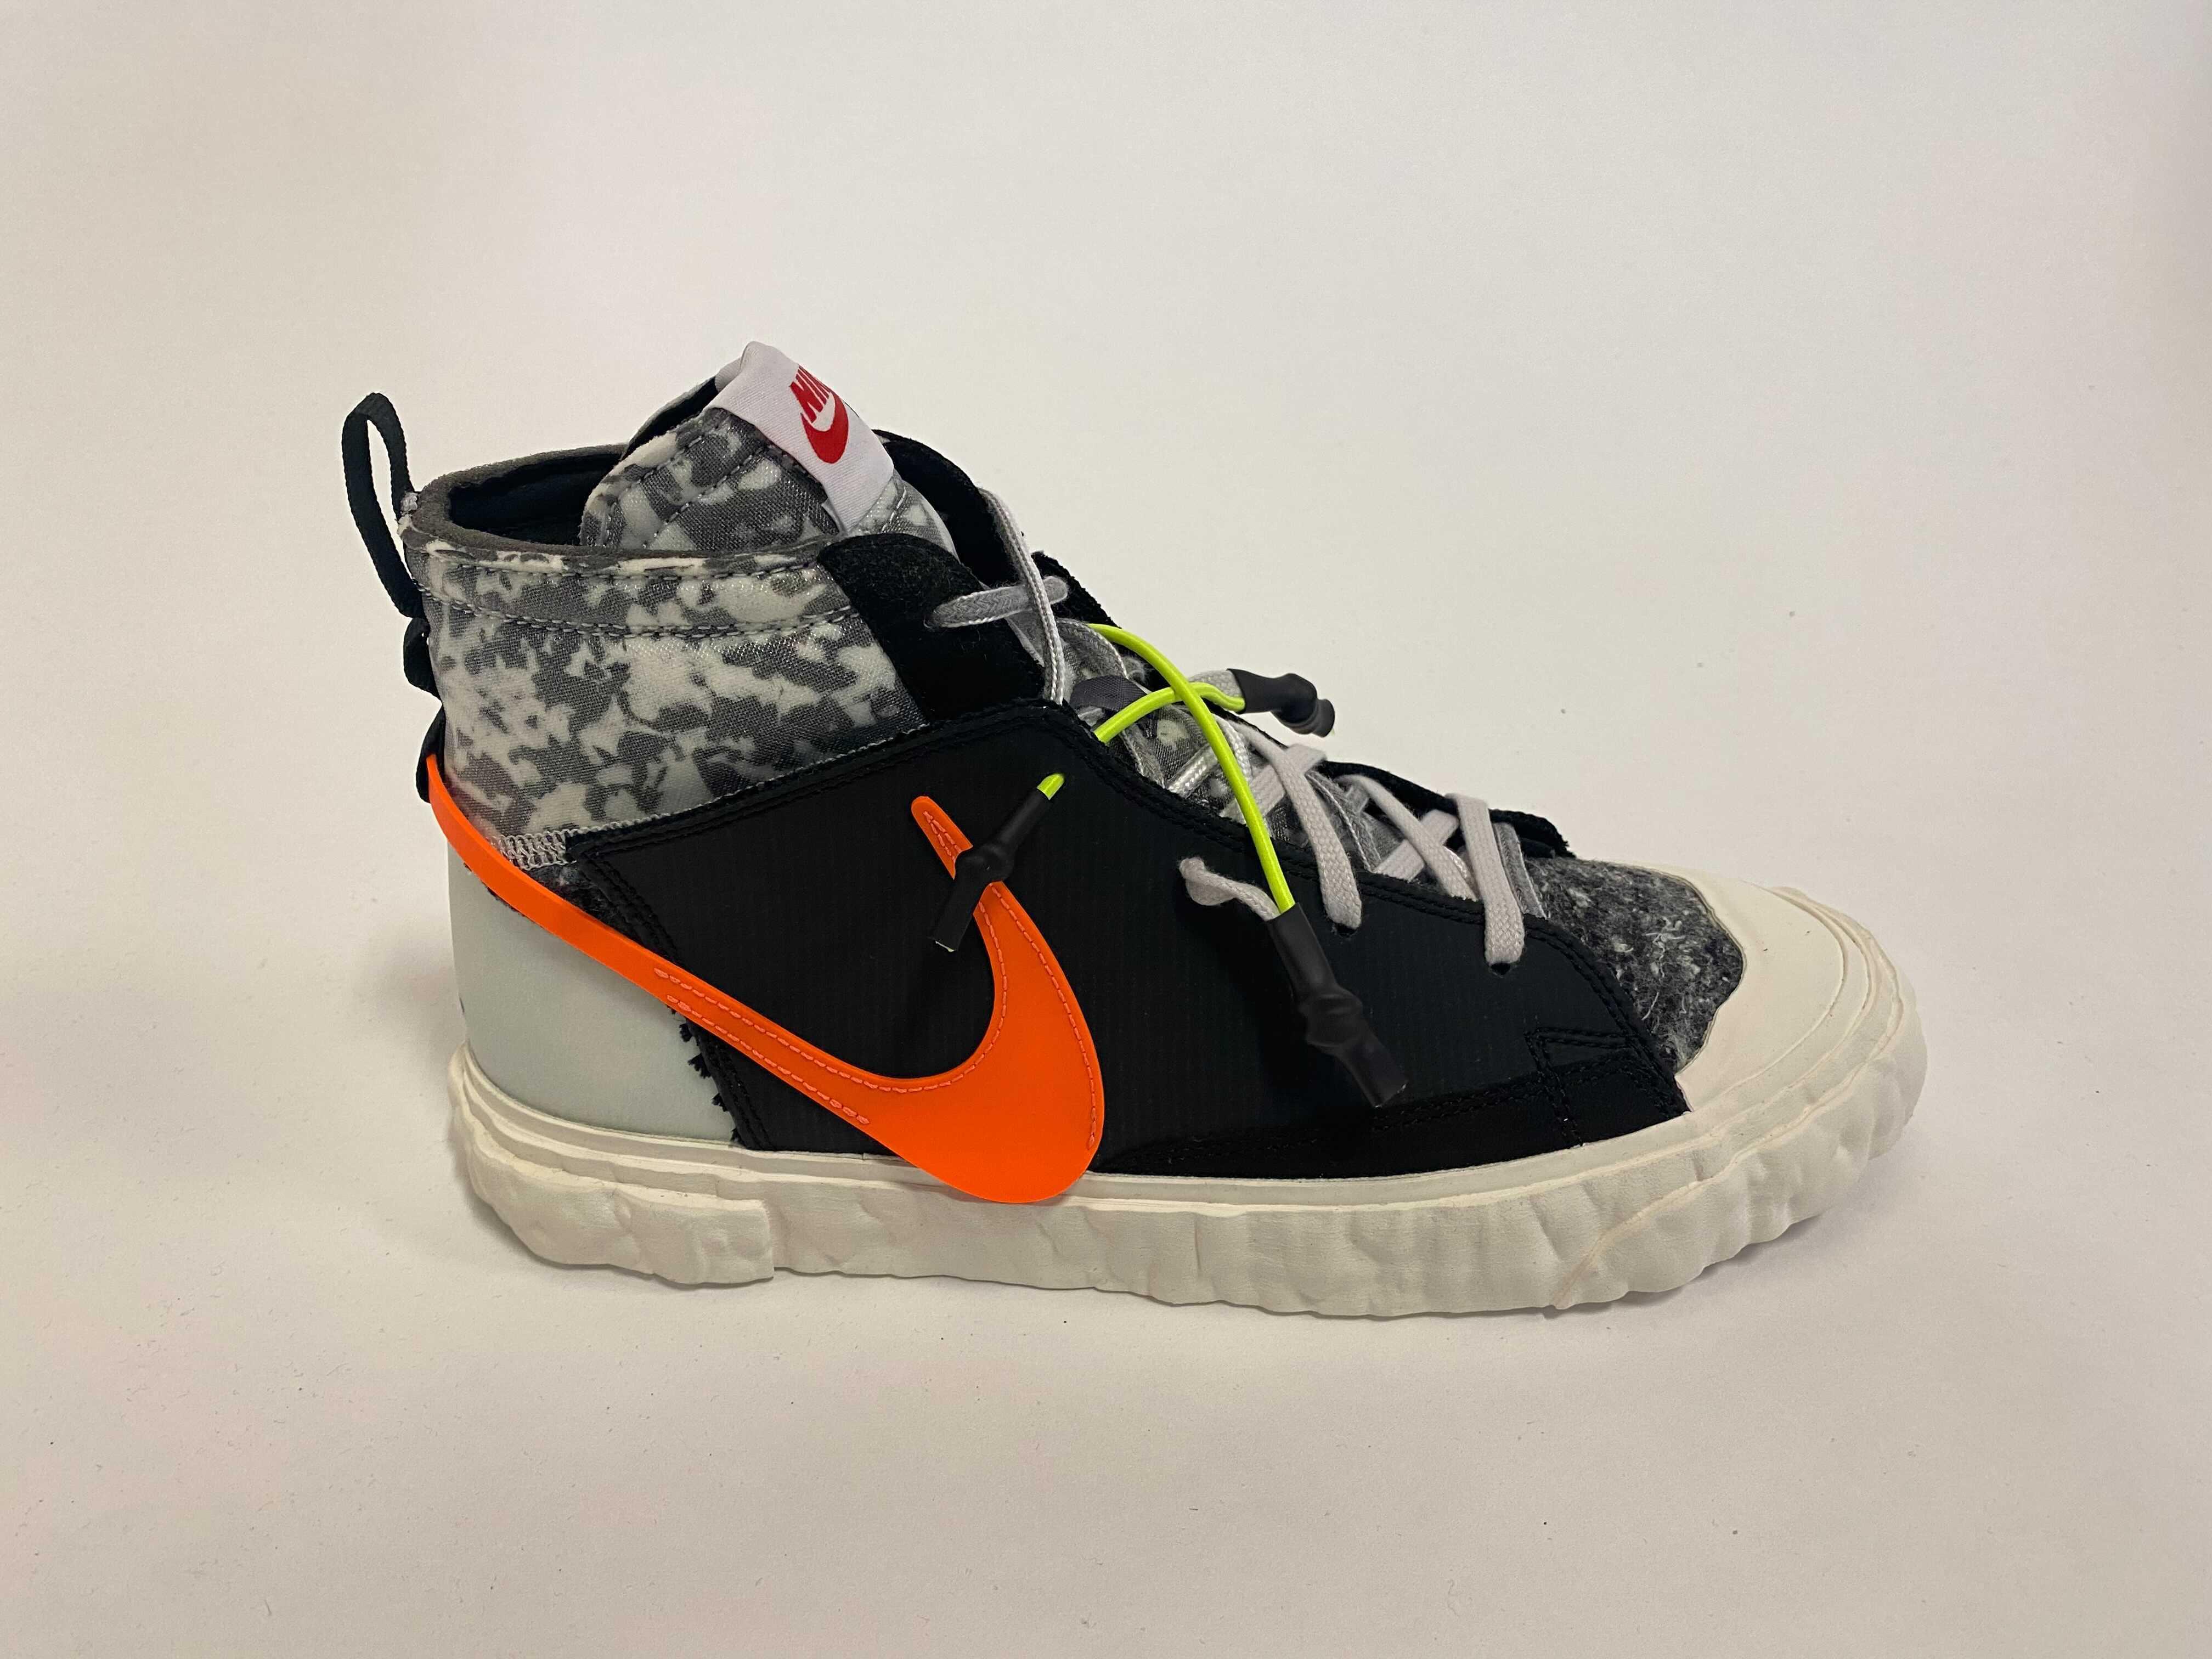 Readymade x Nike Blazer Mid 'Black' CZ3589-001 (Lateral)